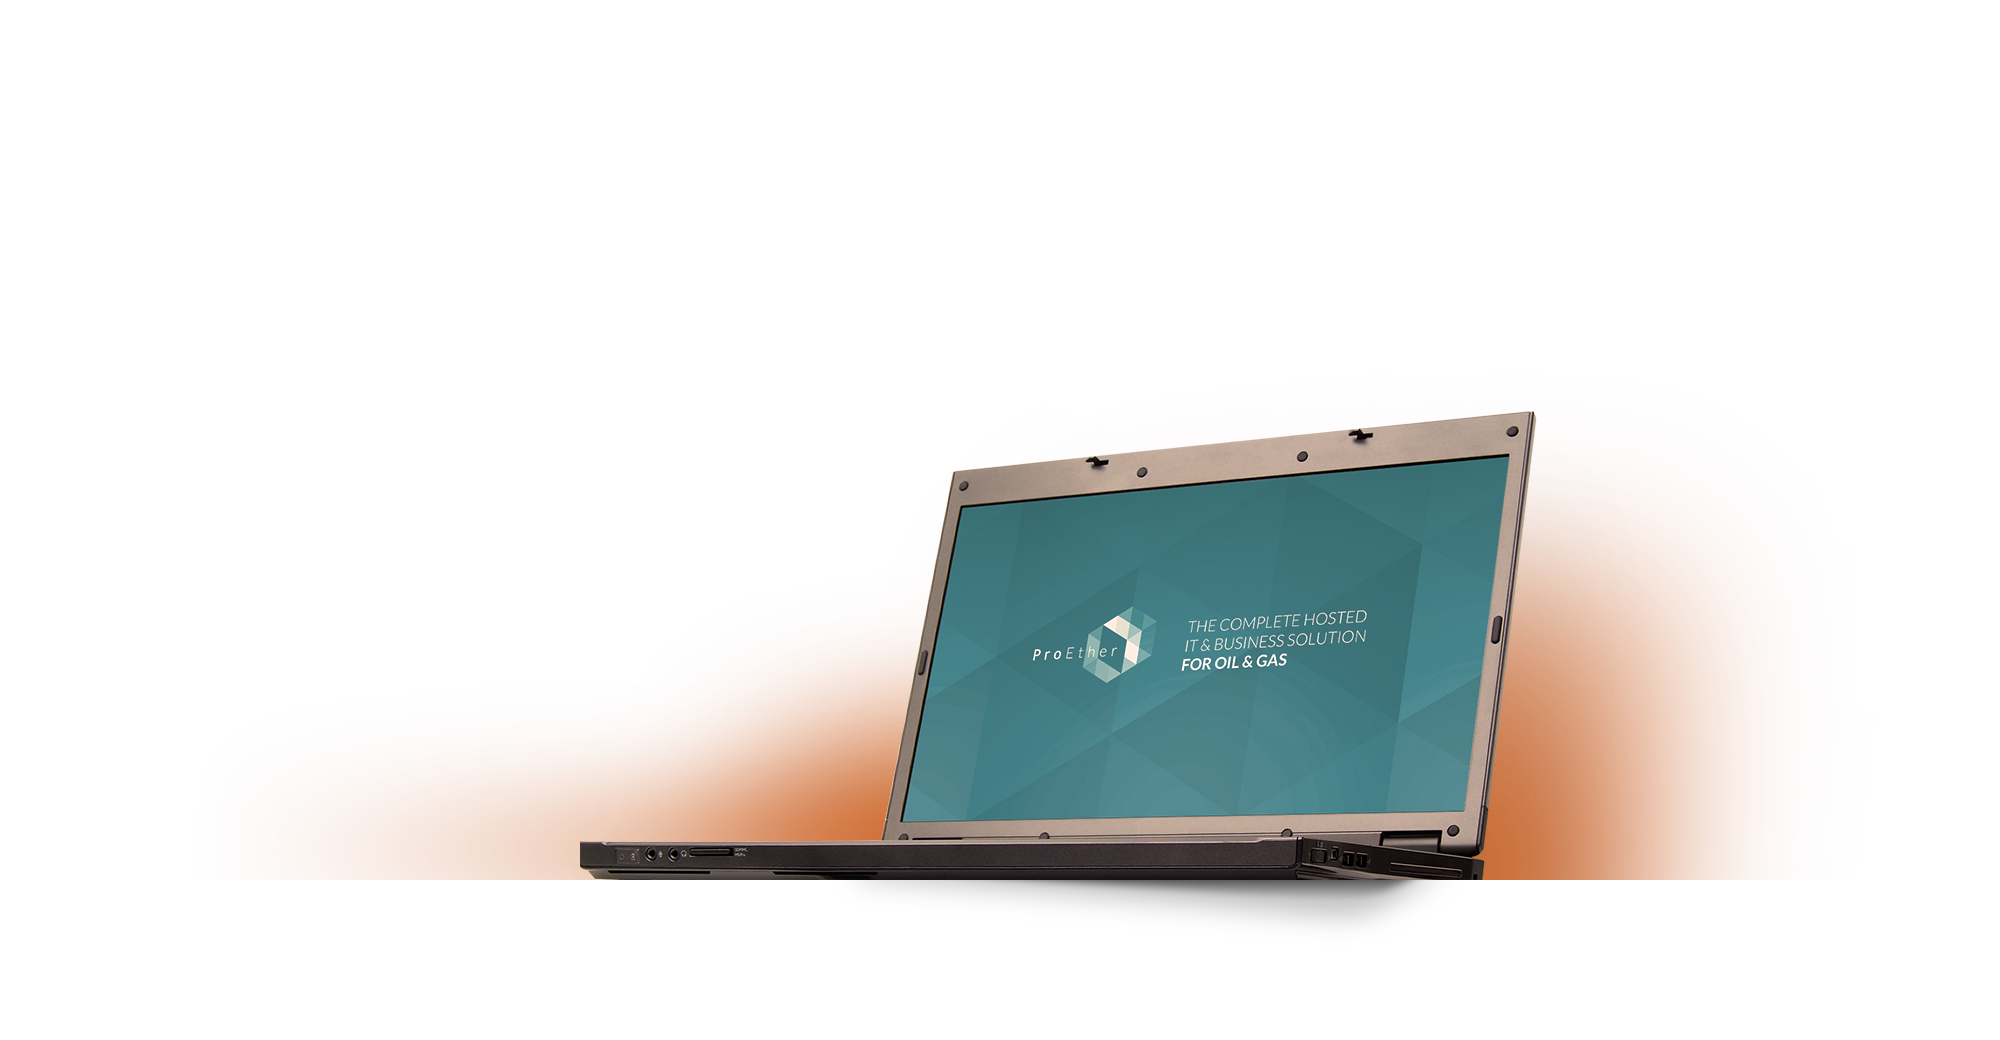 Progressive ProEther cloud solution on laptop